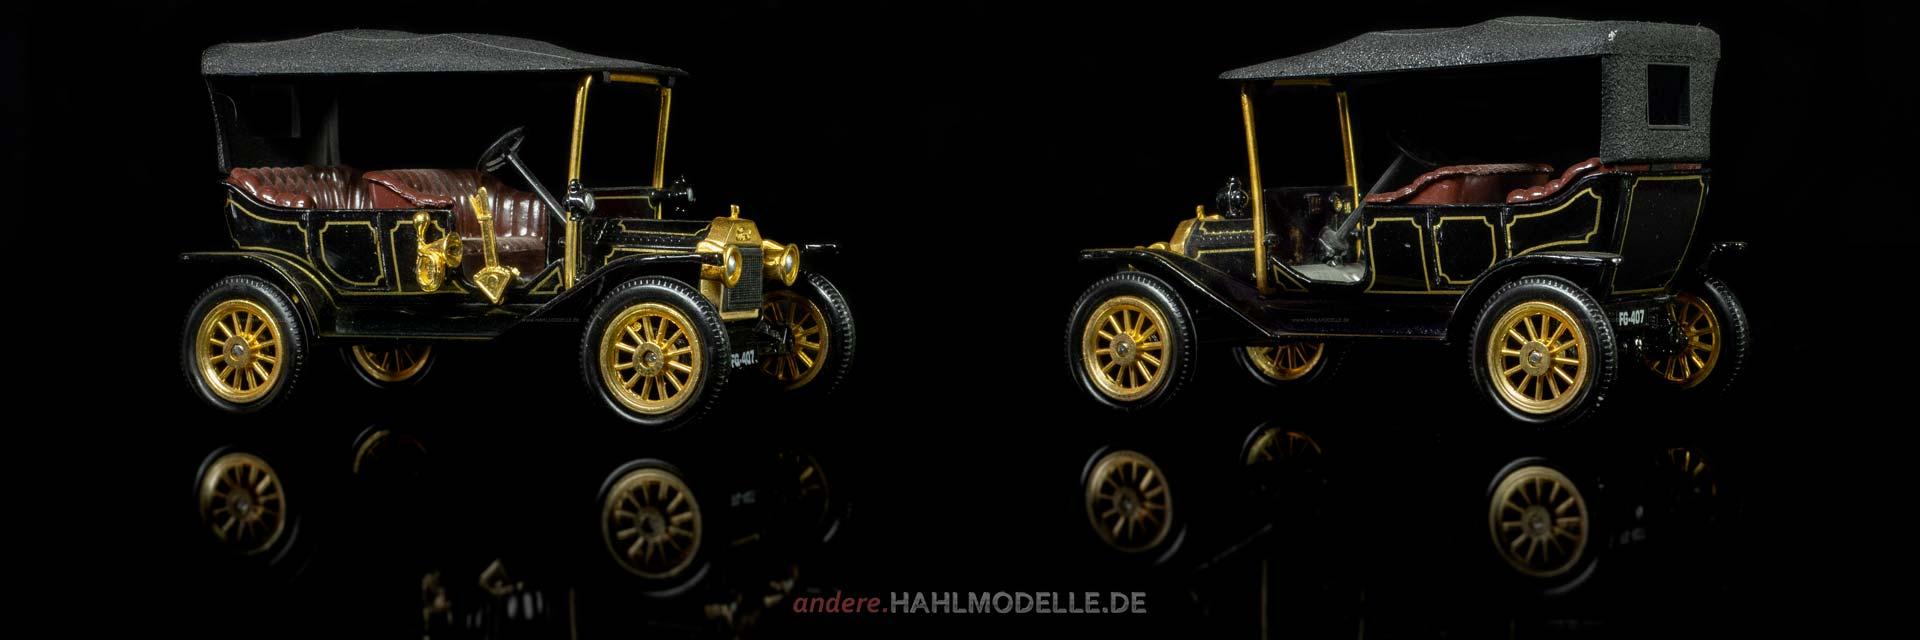 Ford Model T | Cabriolet | Matchbox | 1:43 | www.andere.hahlmodelle.de